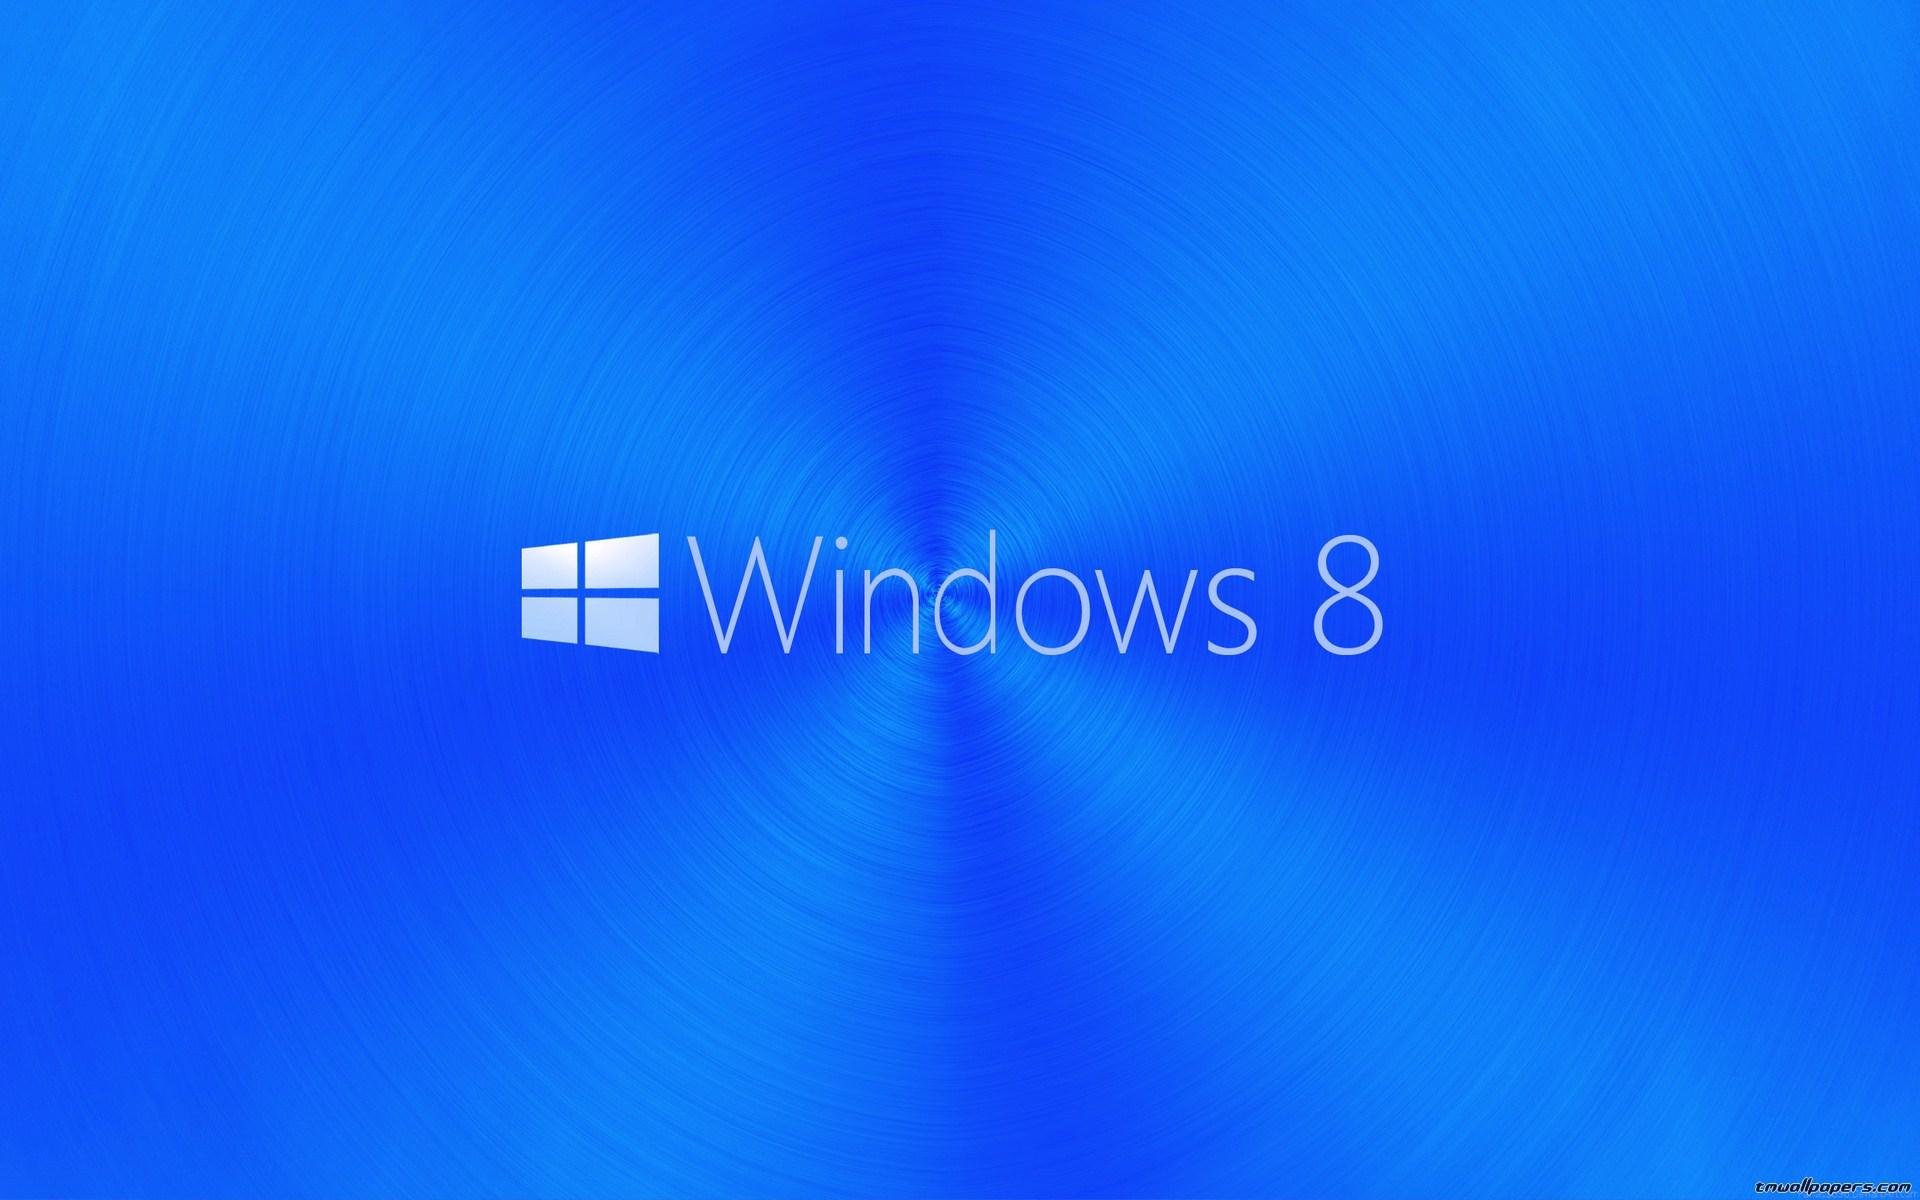 Windows 10 Wallpaper 1920X1200 - WallpaperSafari